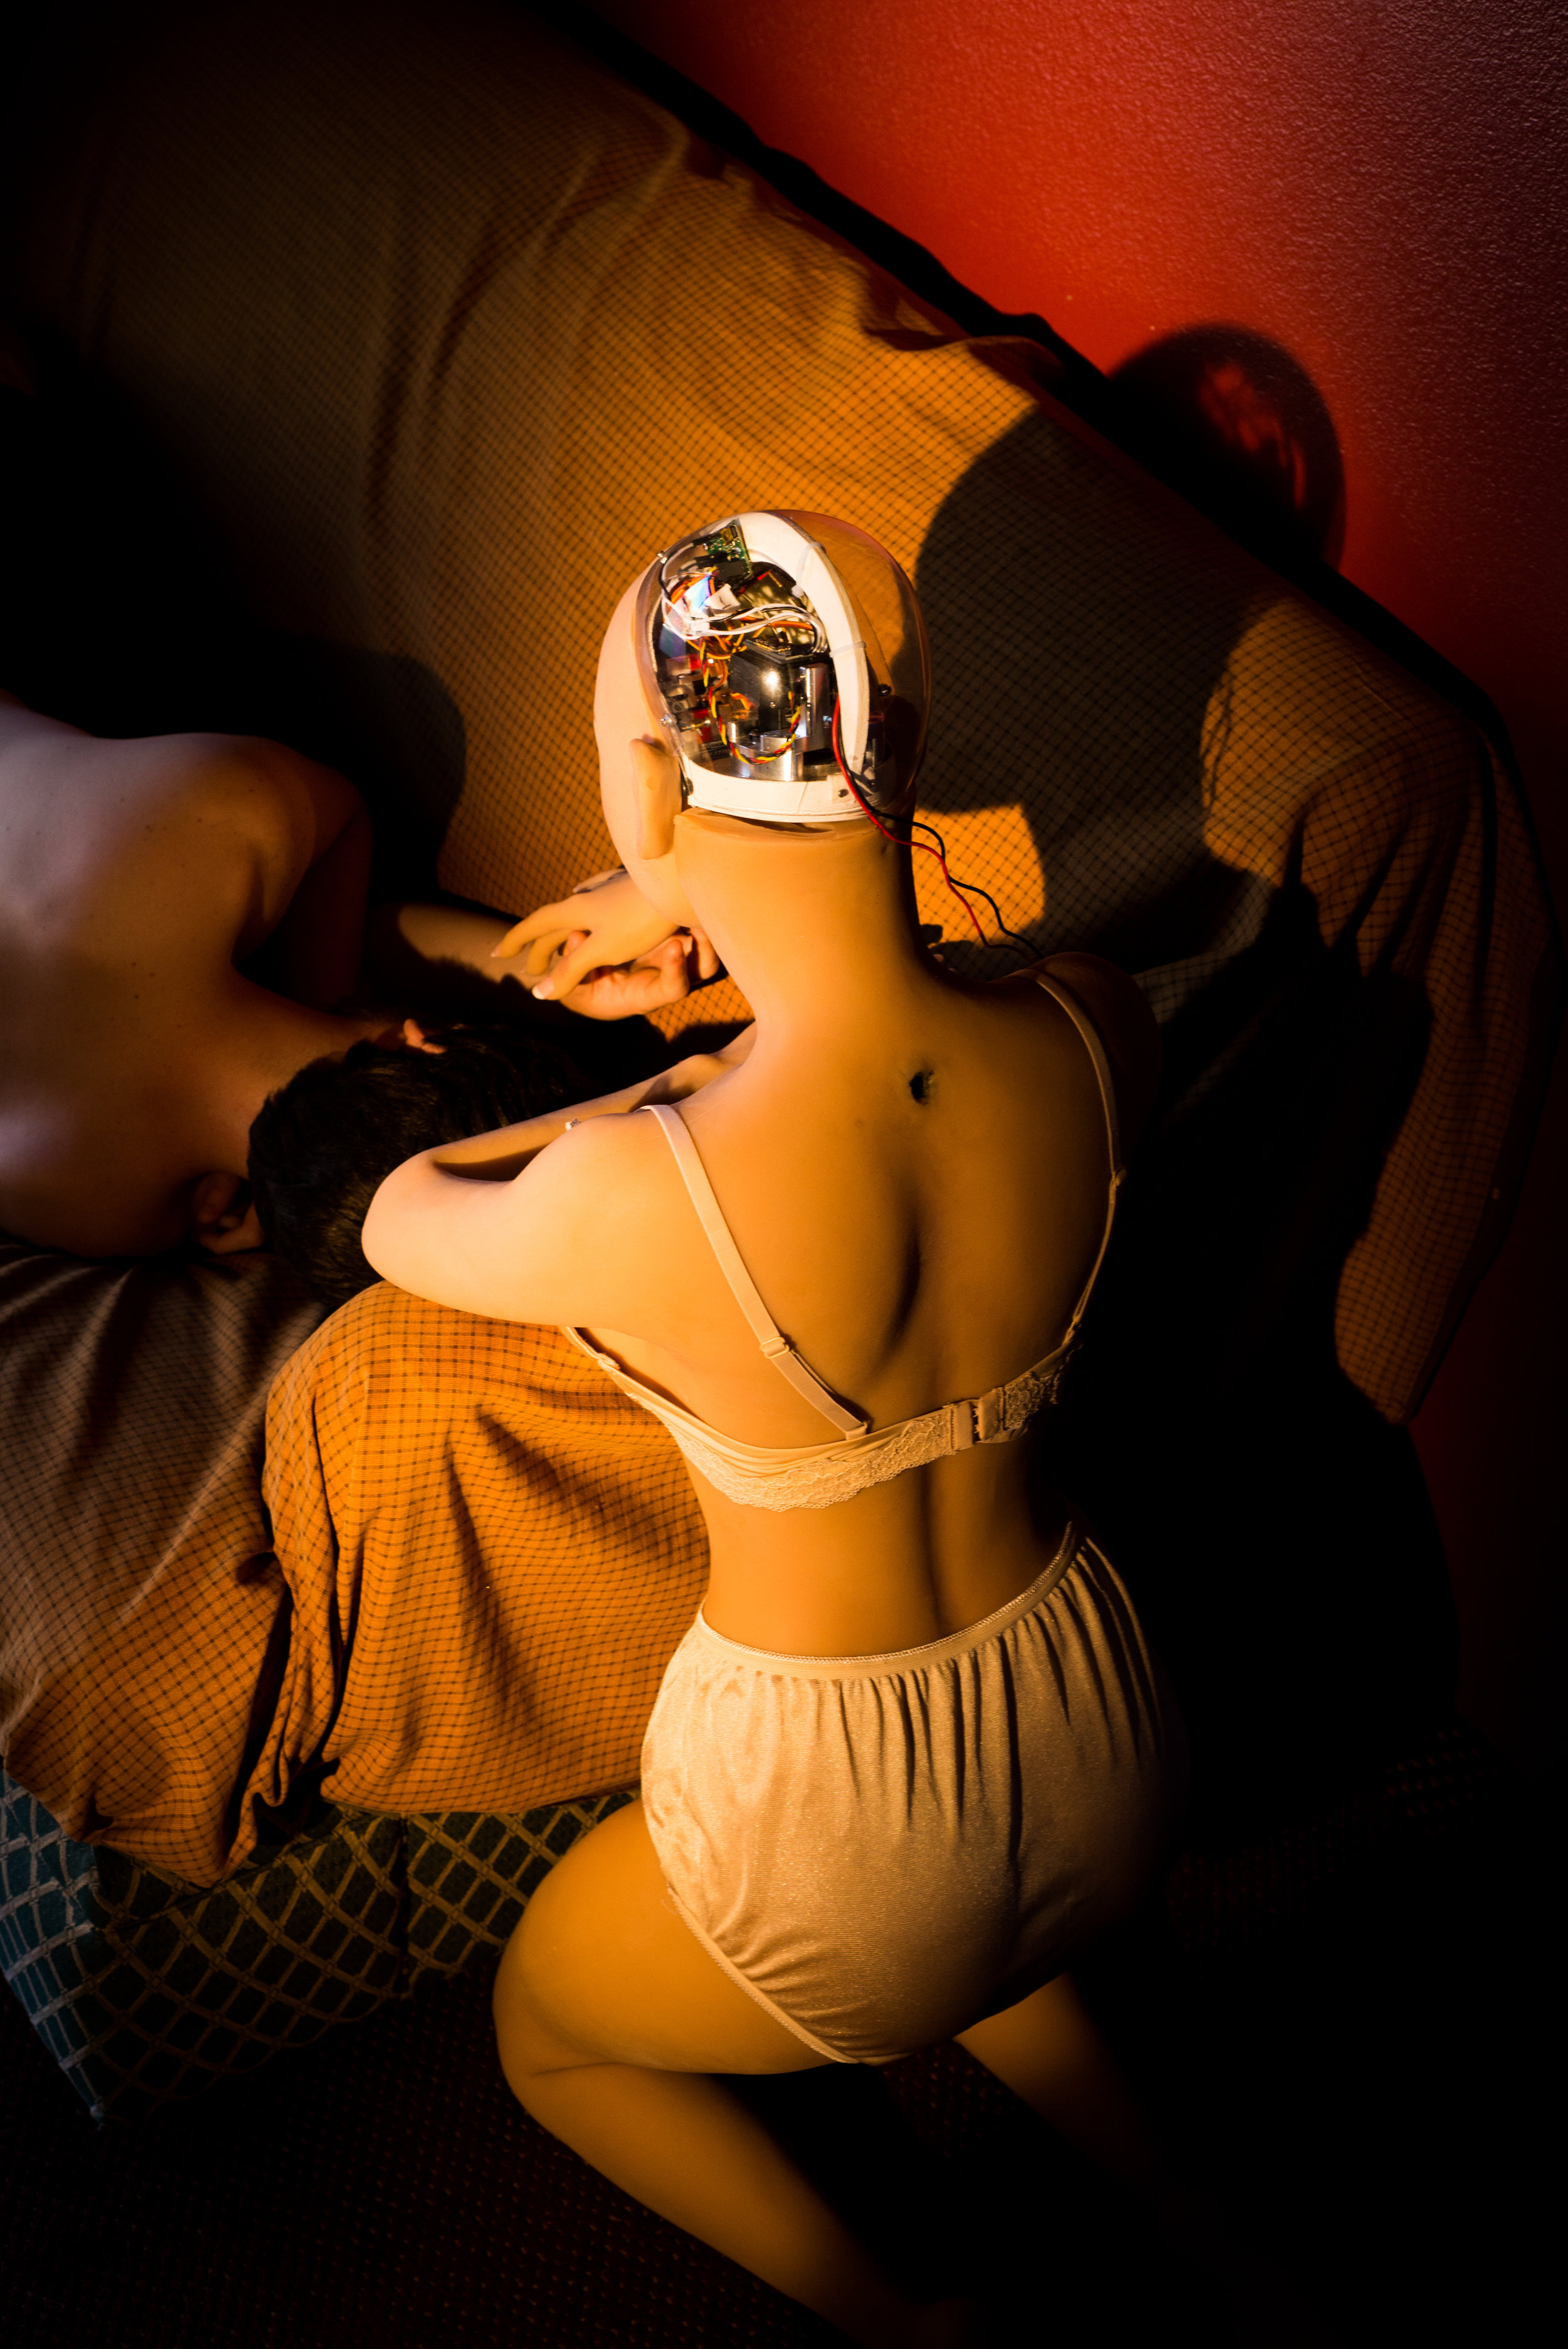 Sex-robots-1-2.jpg